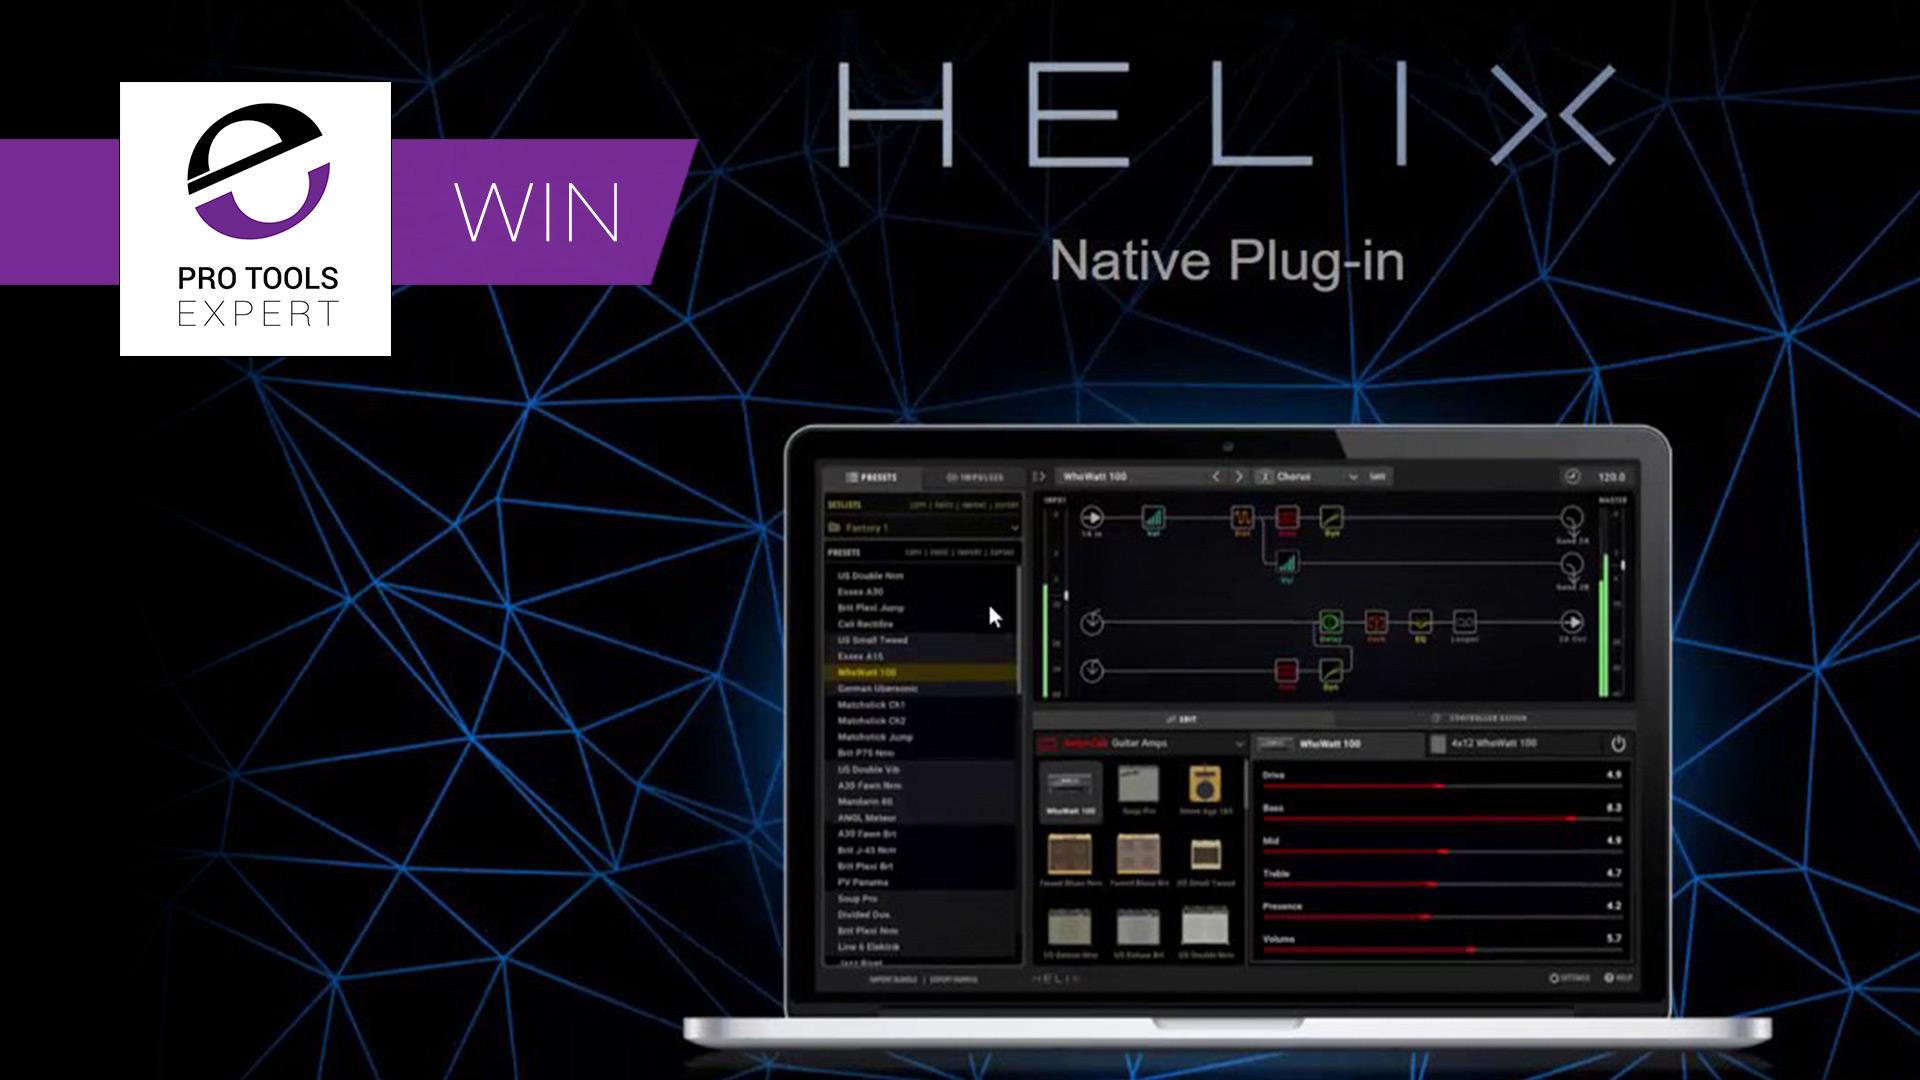 win-helix-native-guitar-plug-in-pro-tools-expert.jpg